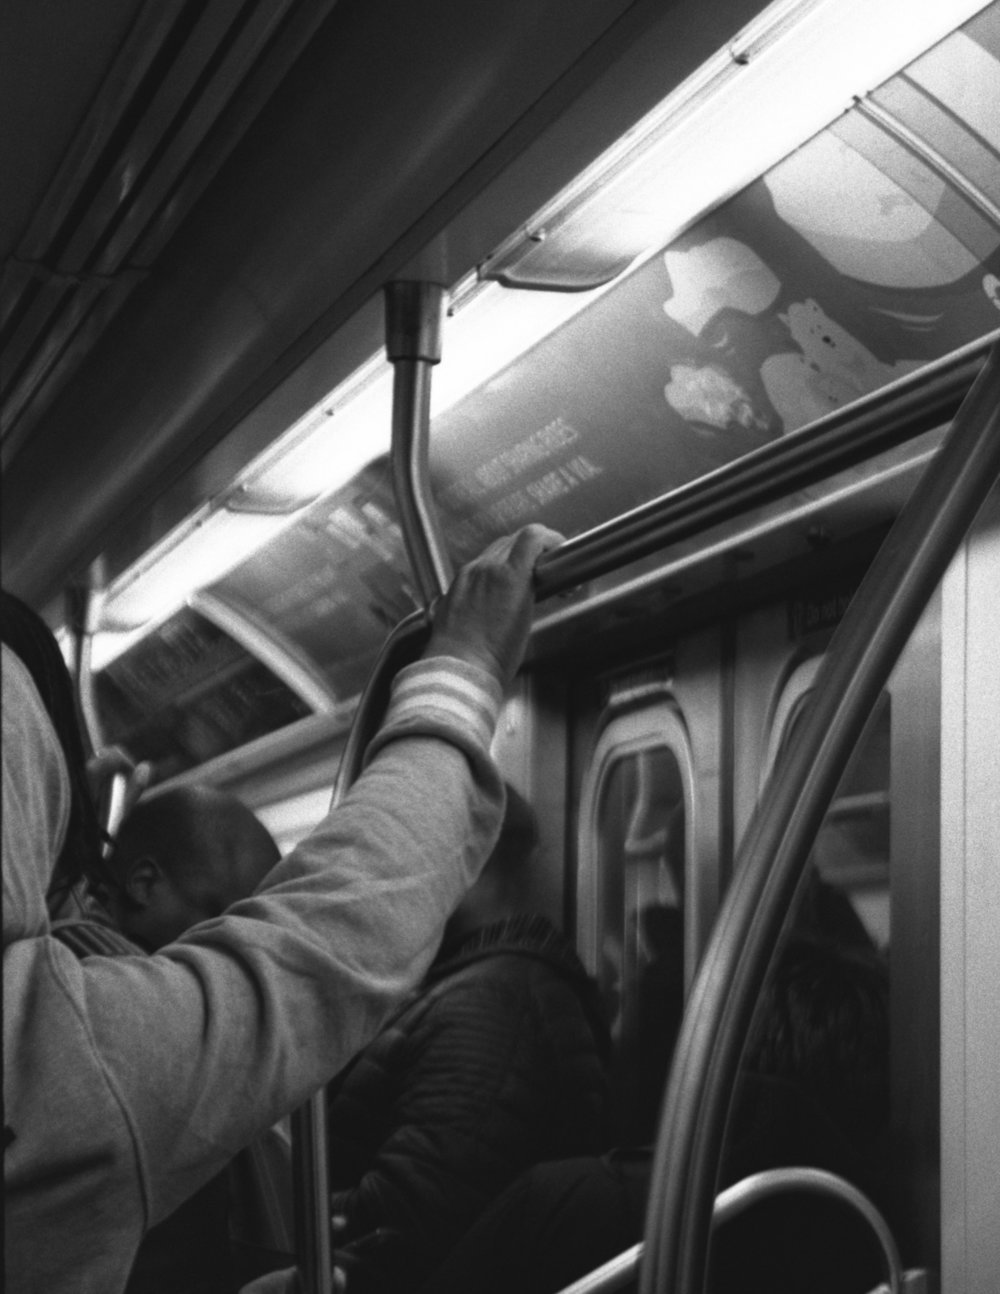 20496930-SamanthaDiaz_SubwayRails_FilmPhotography_8.5x11_110.jpg